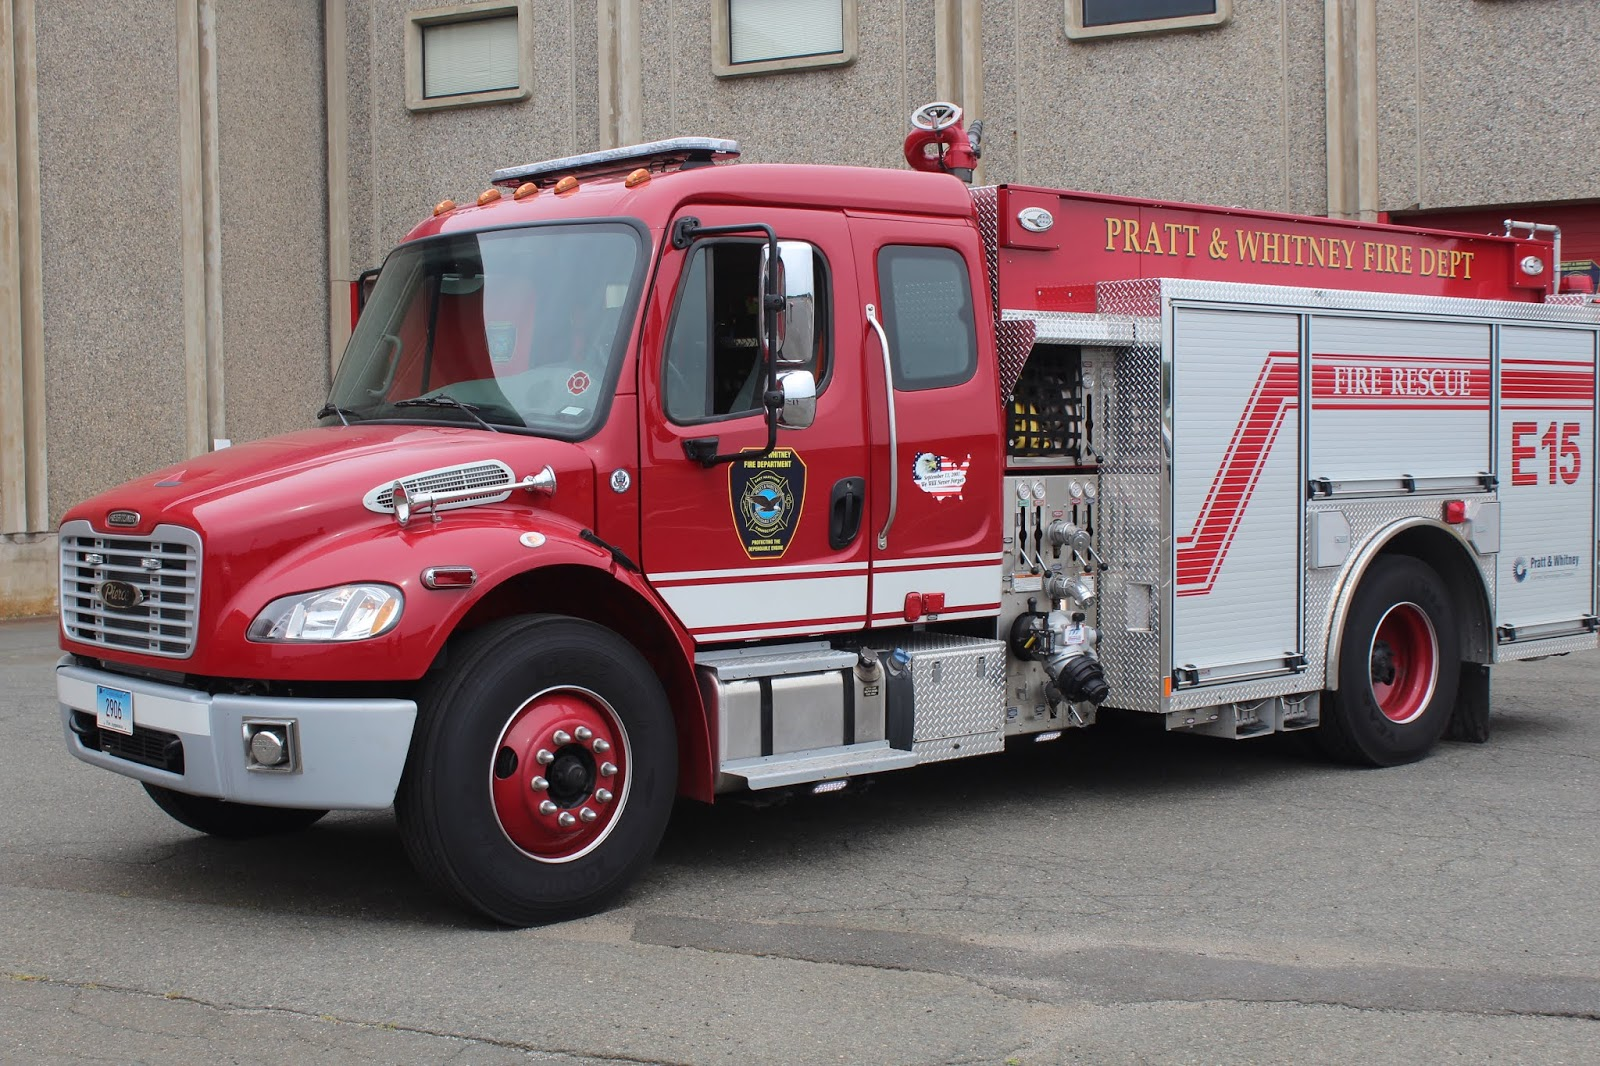 Fire Mike On All Things Fire Pratt Amp Whitney Fire Dept